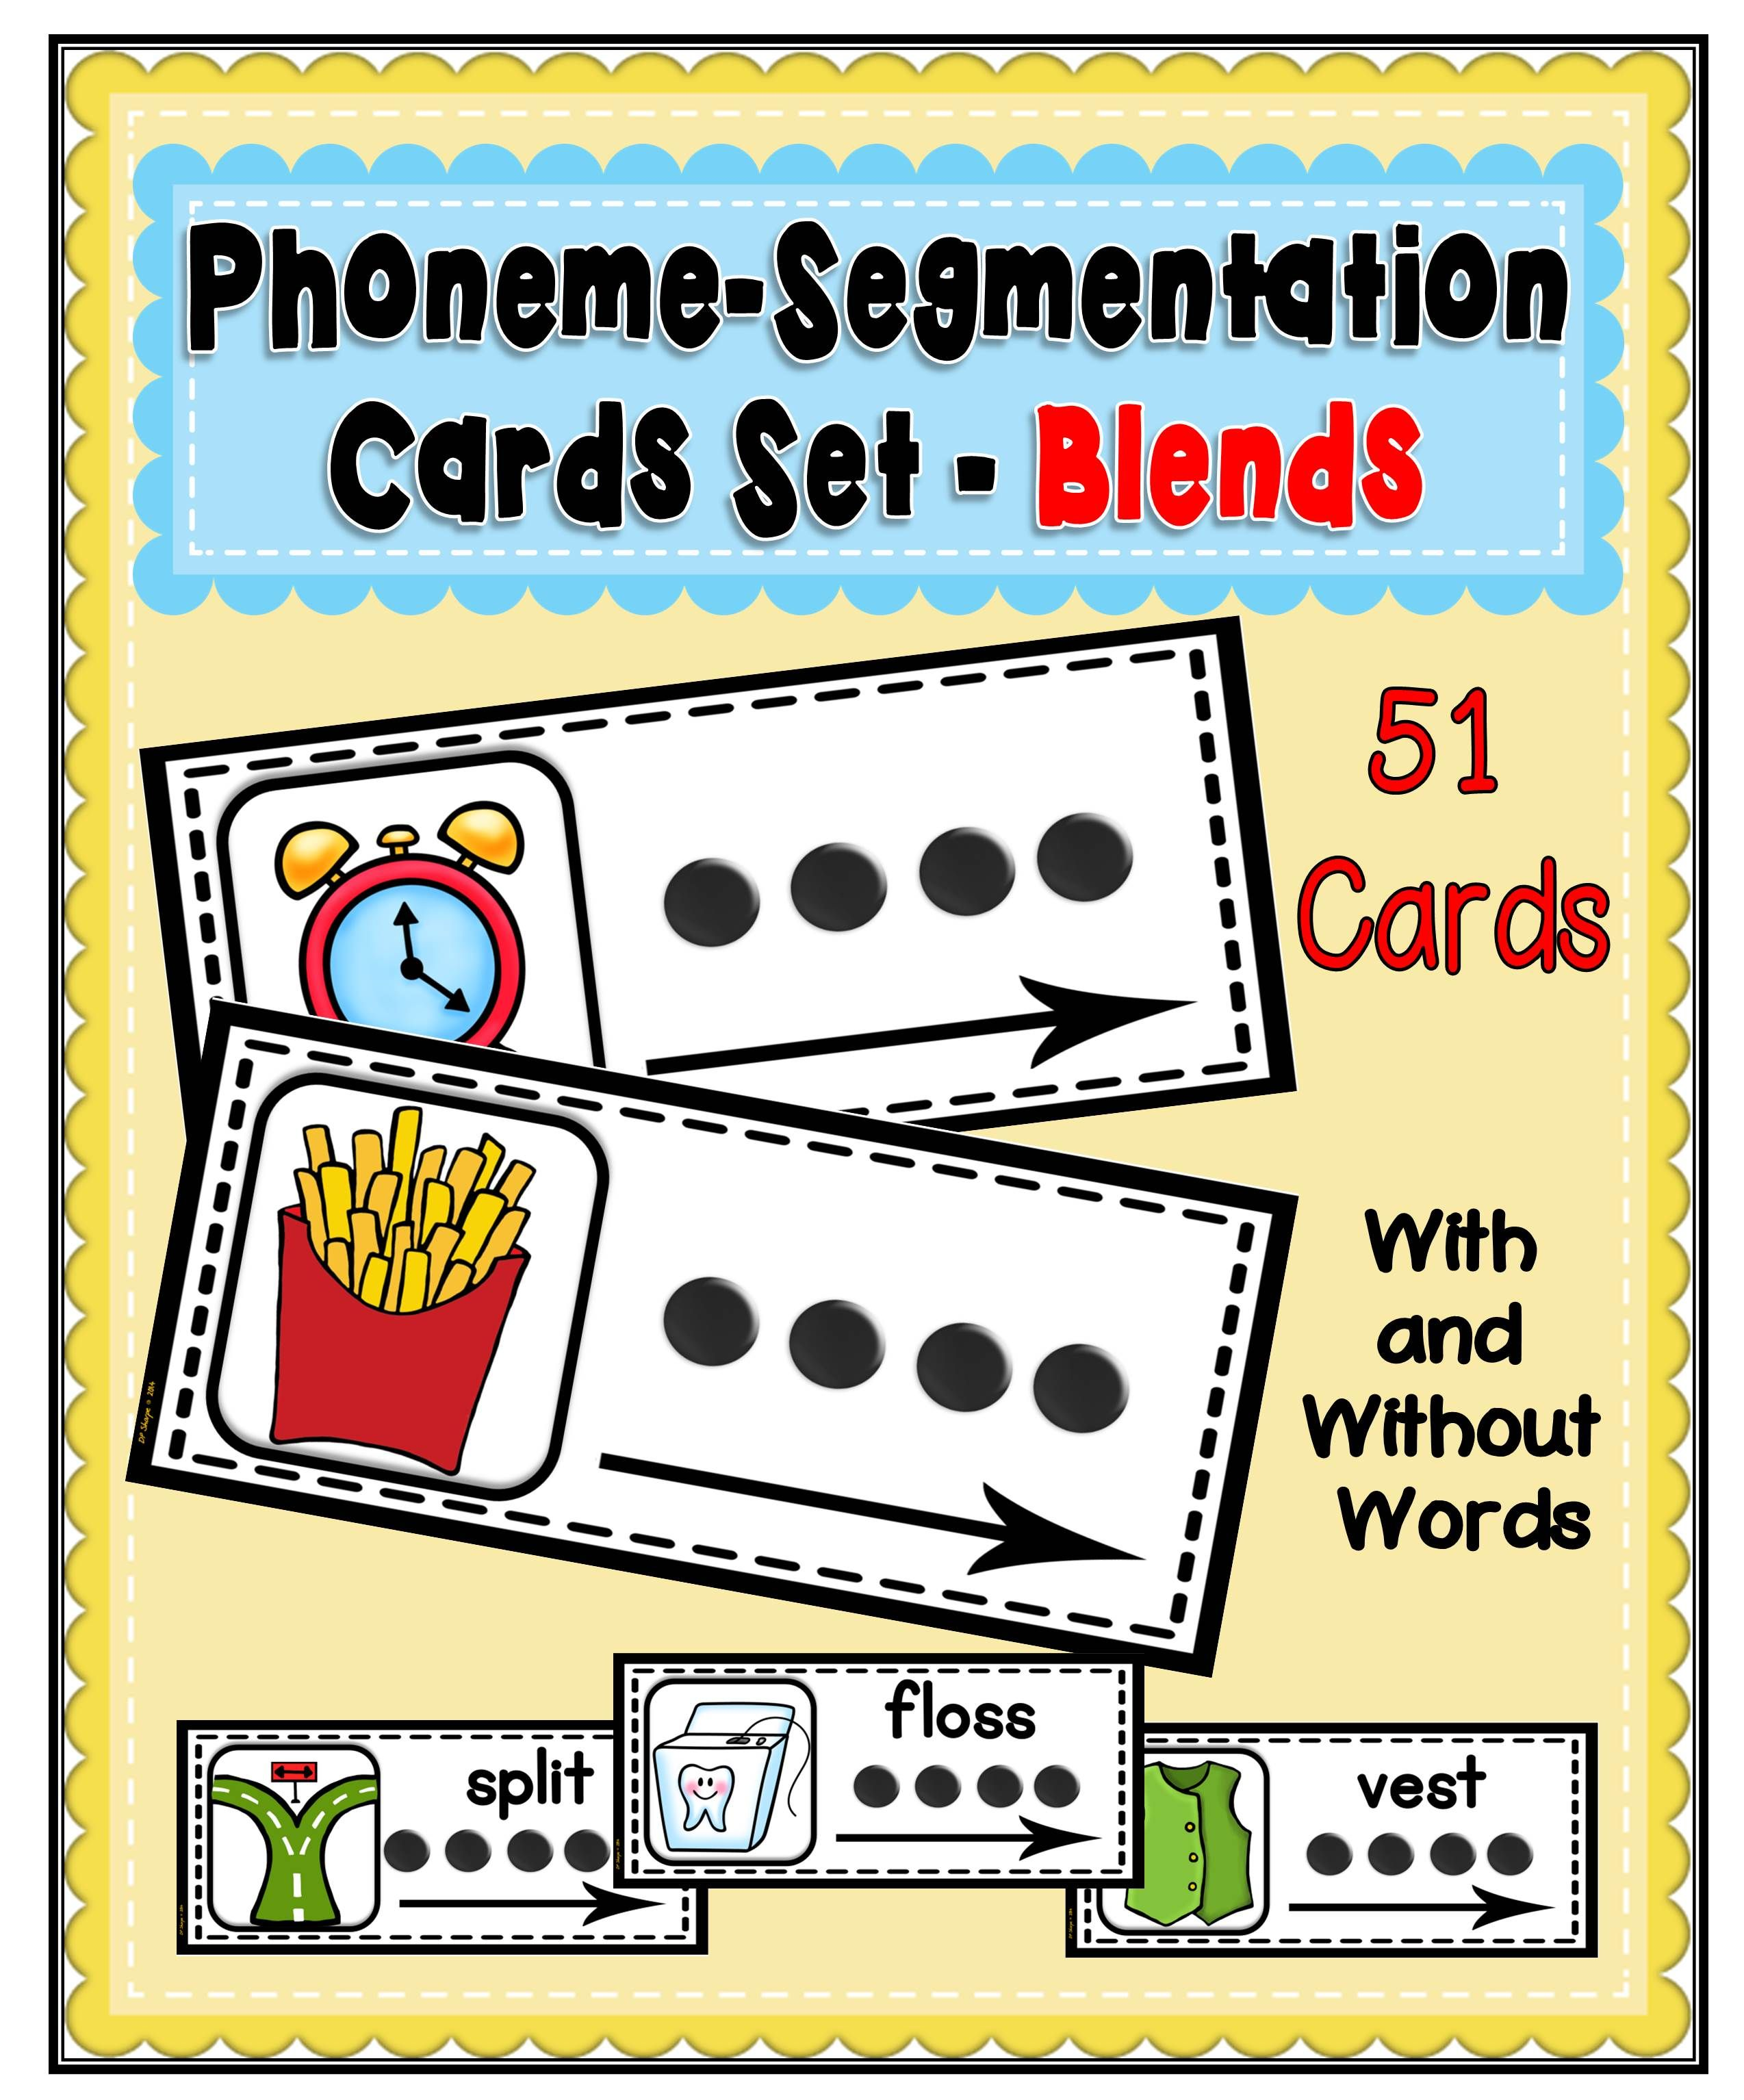 Phoneme Segmentation Card Set Blends